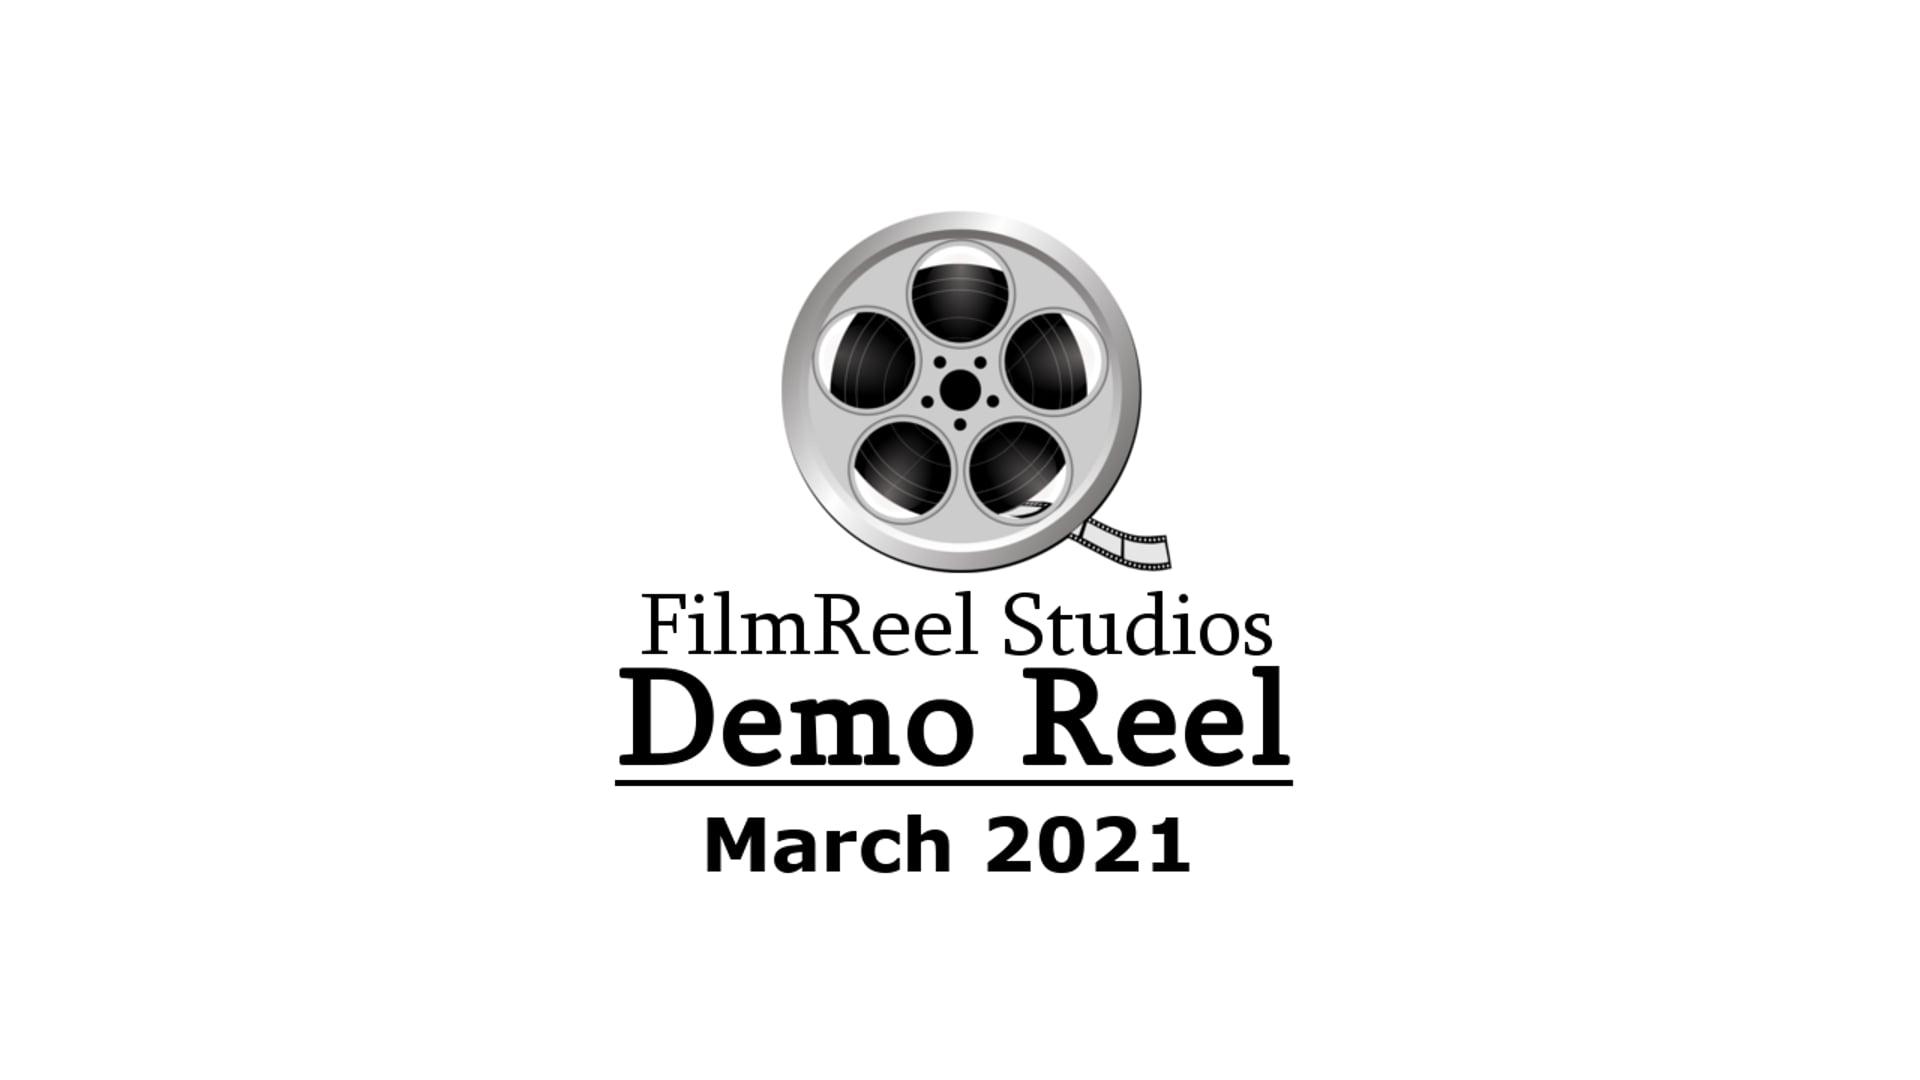 FilmReel Studios - Demo Reel March 2021